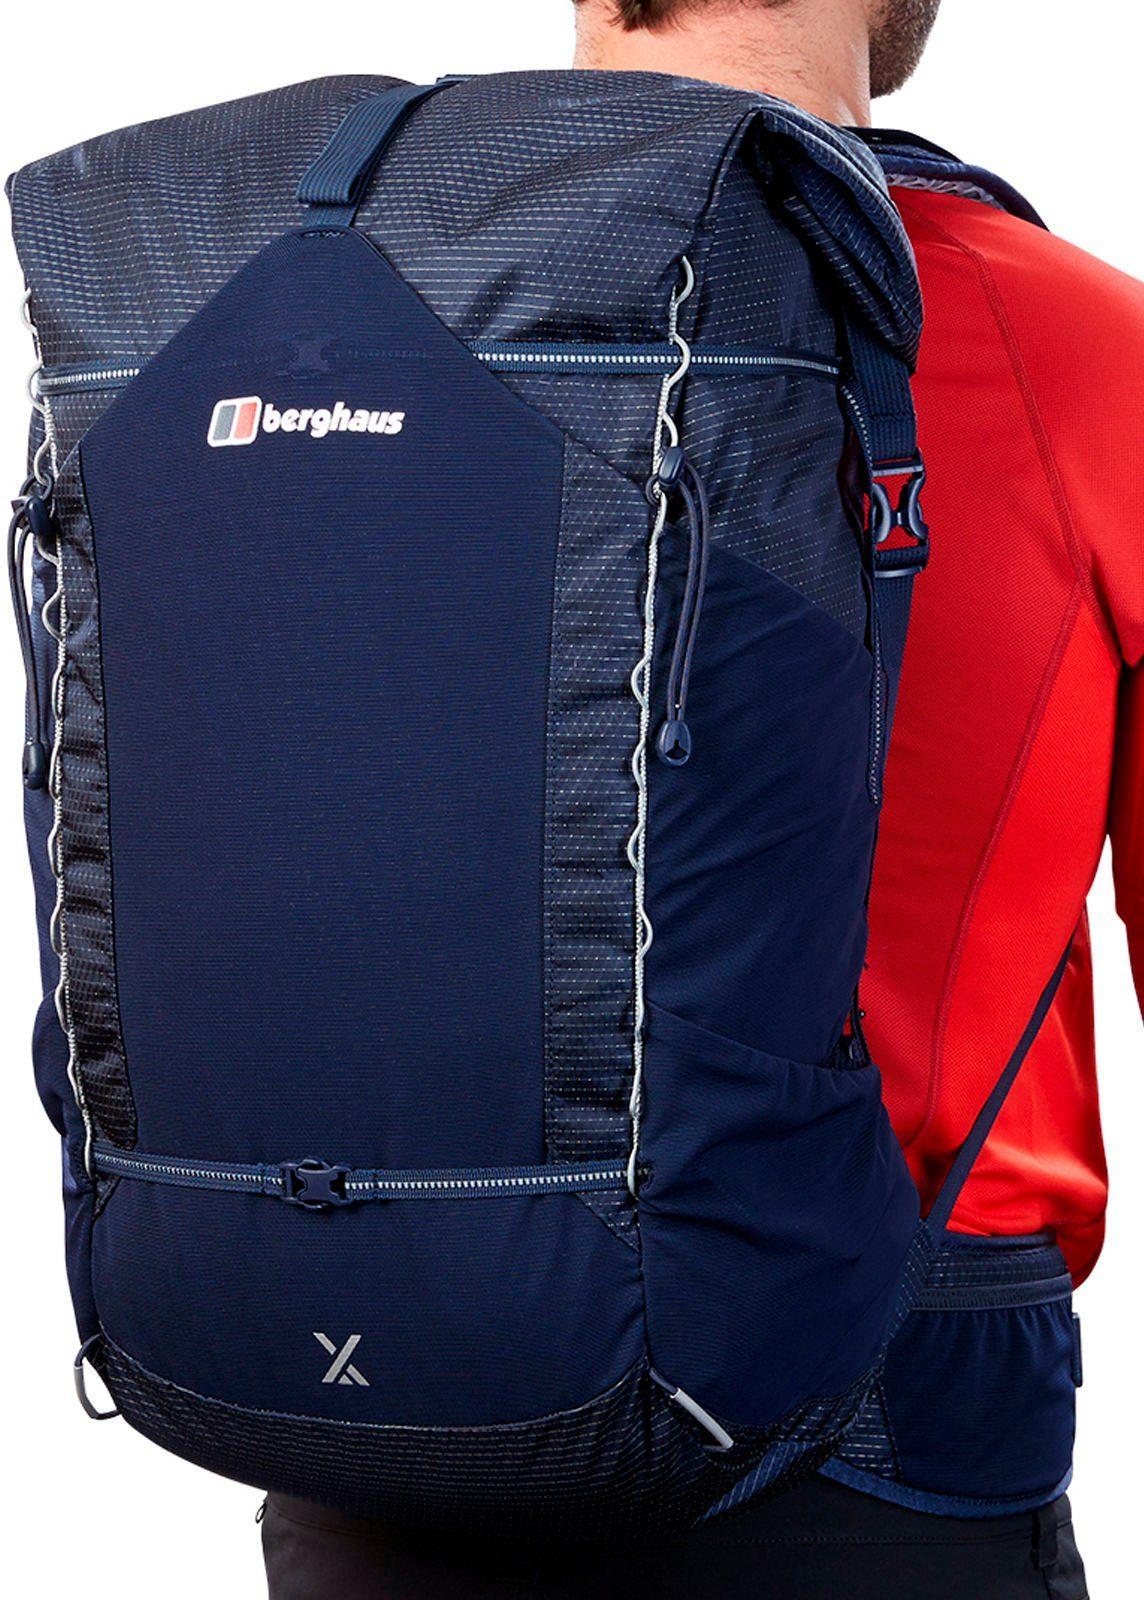 Berghaus Wanderrucksack »Fast Hike 45 Backpack«